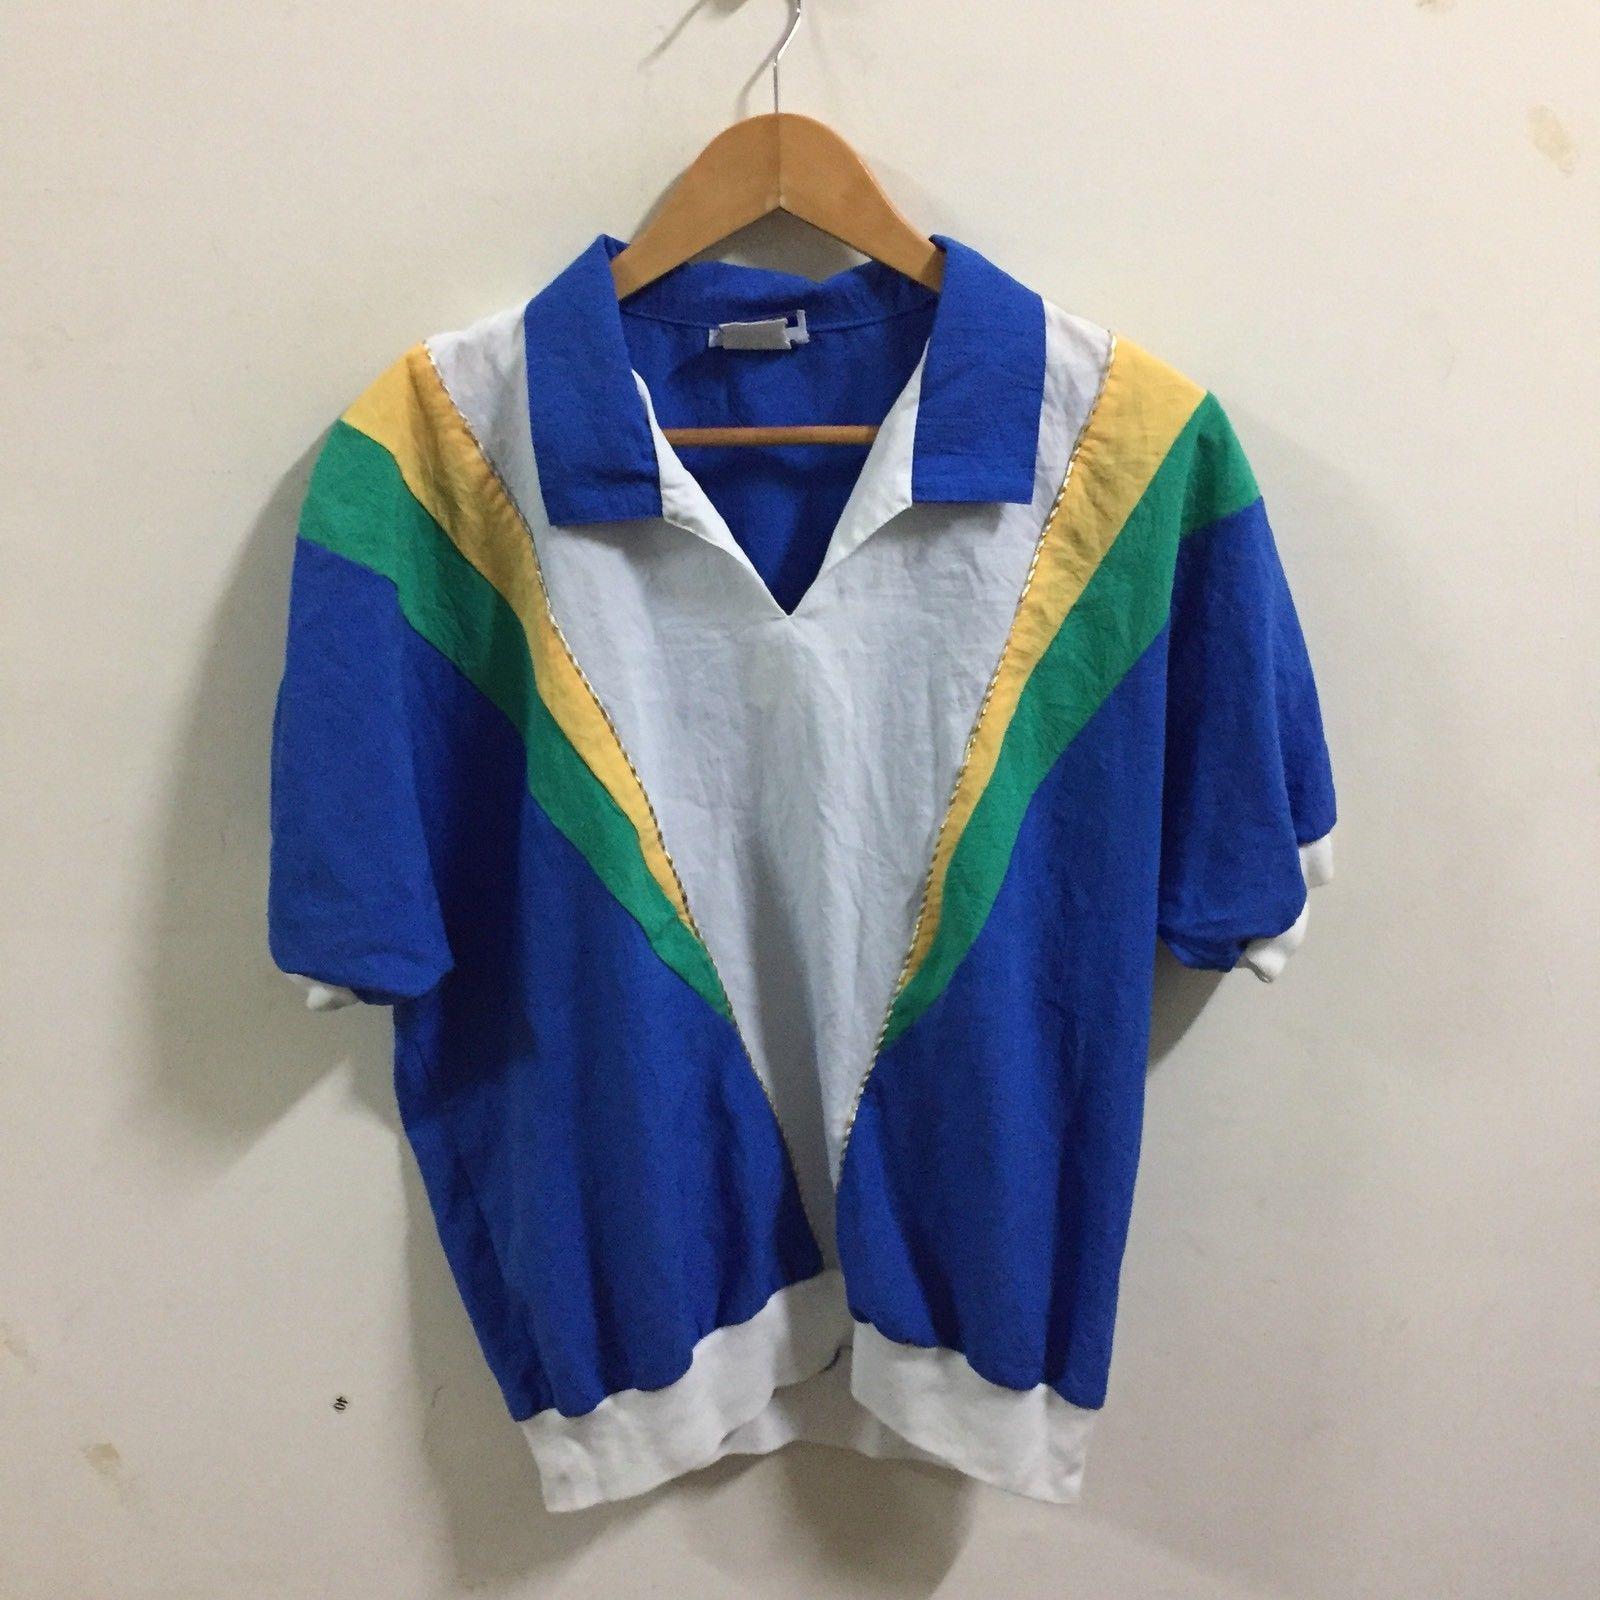 VTG 90's Gape God Tops T-Shirt SZ L ColorBlock  Rare Made In USA